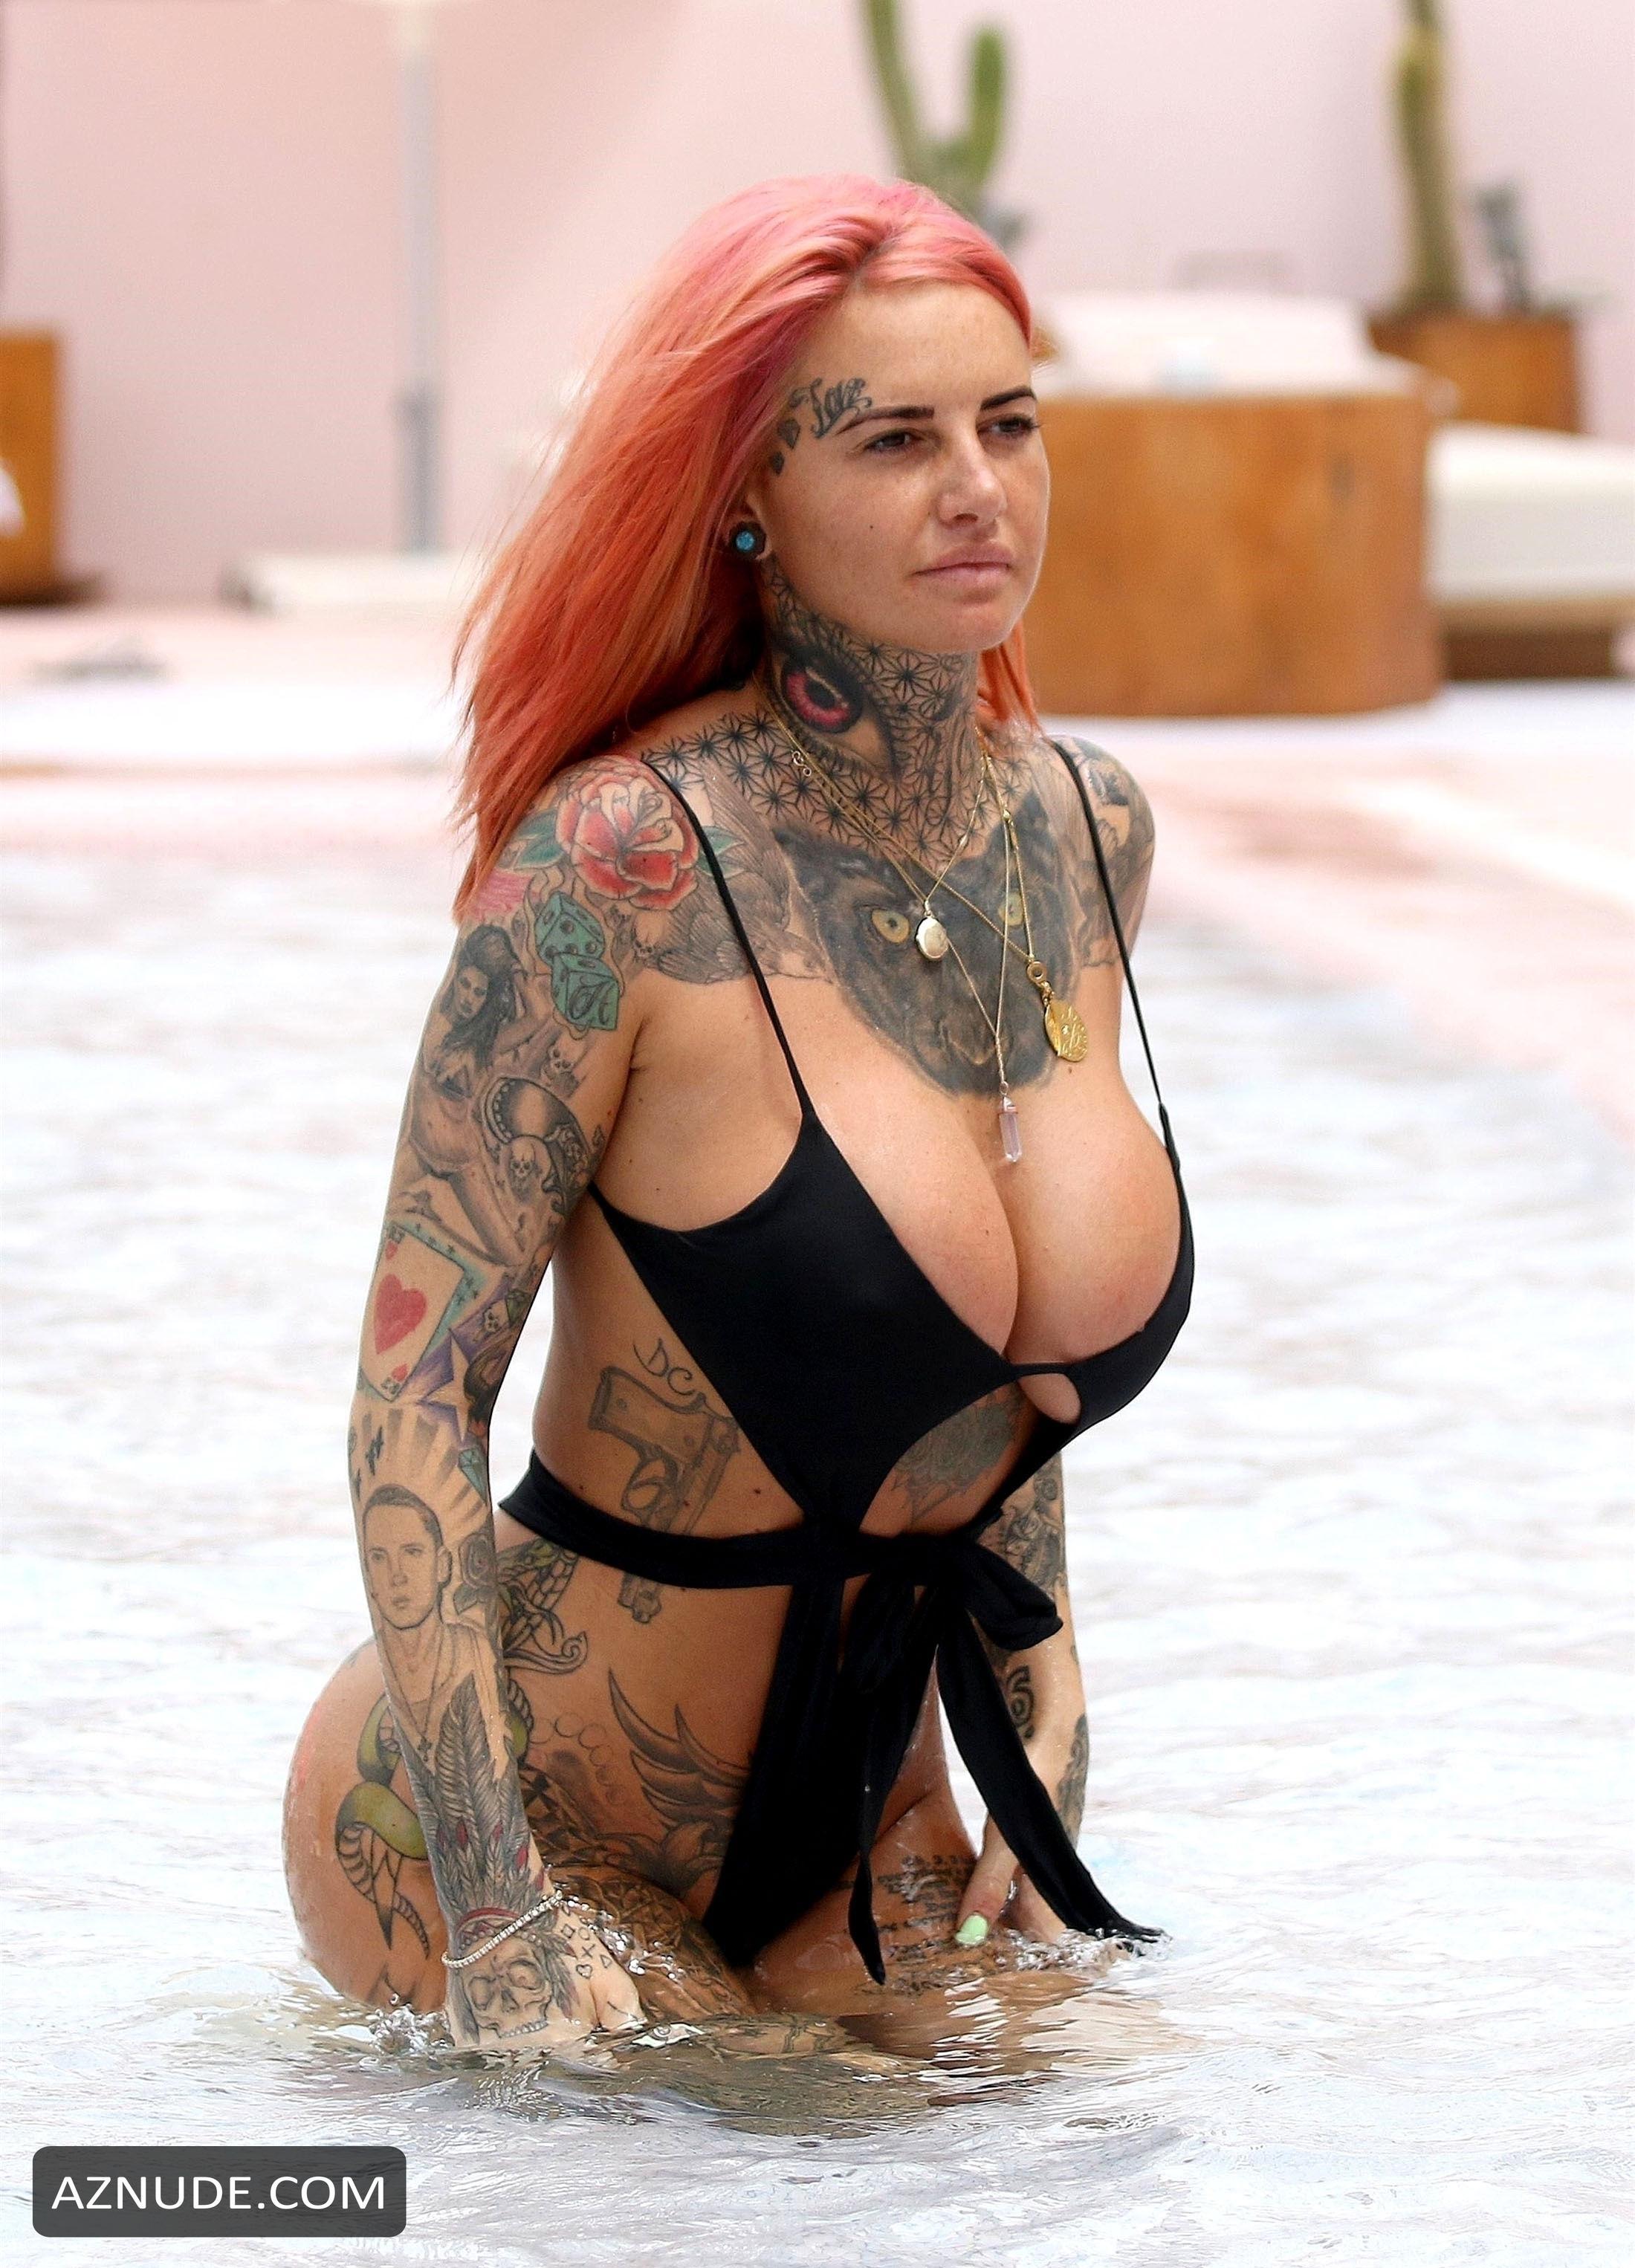 CelebGate Andrea Yurko Nude -,Natasha oakley topless australian model showed curves bikini Erotic photos Bella Thorne Full Boob Slip,Briahna Gilbert Hot